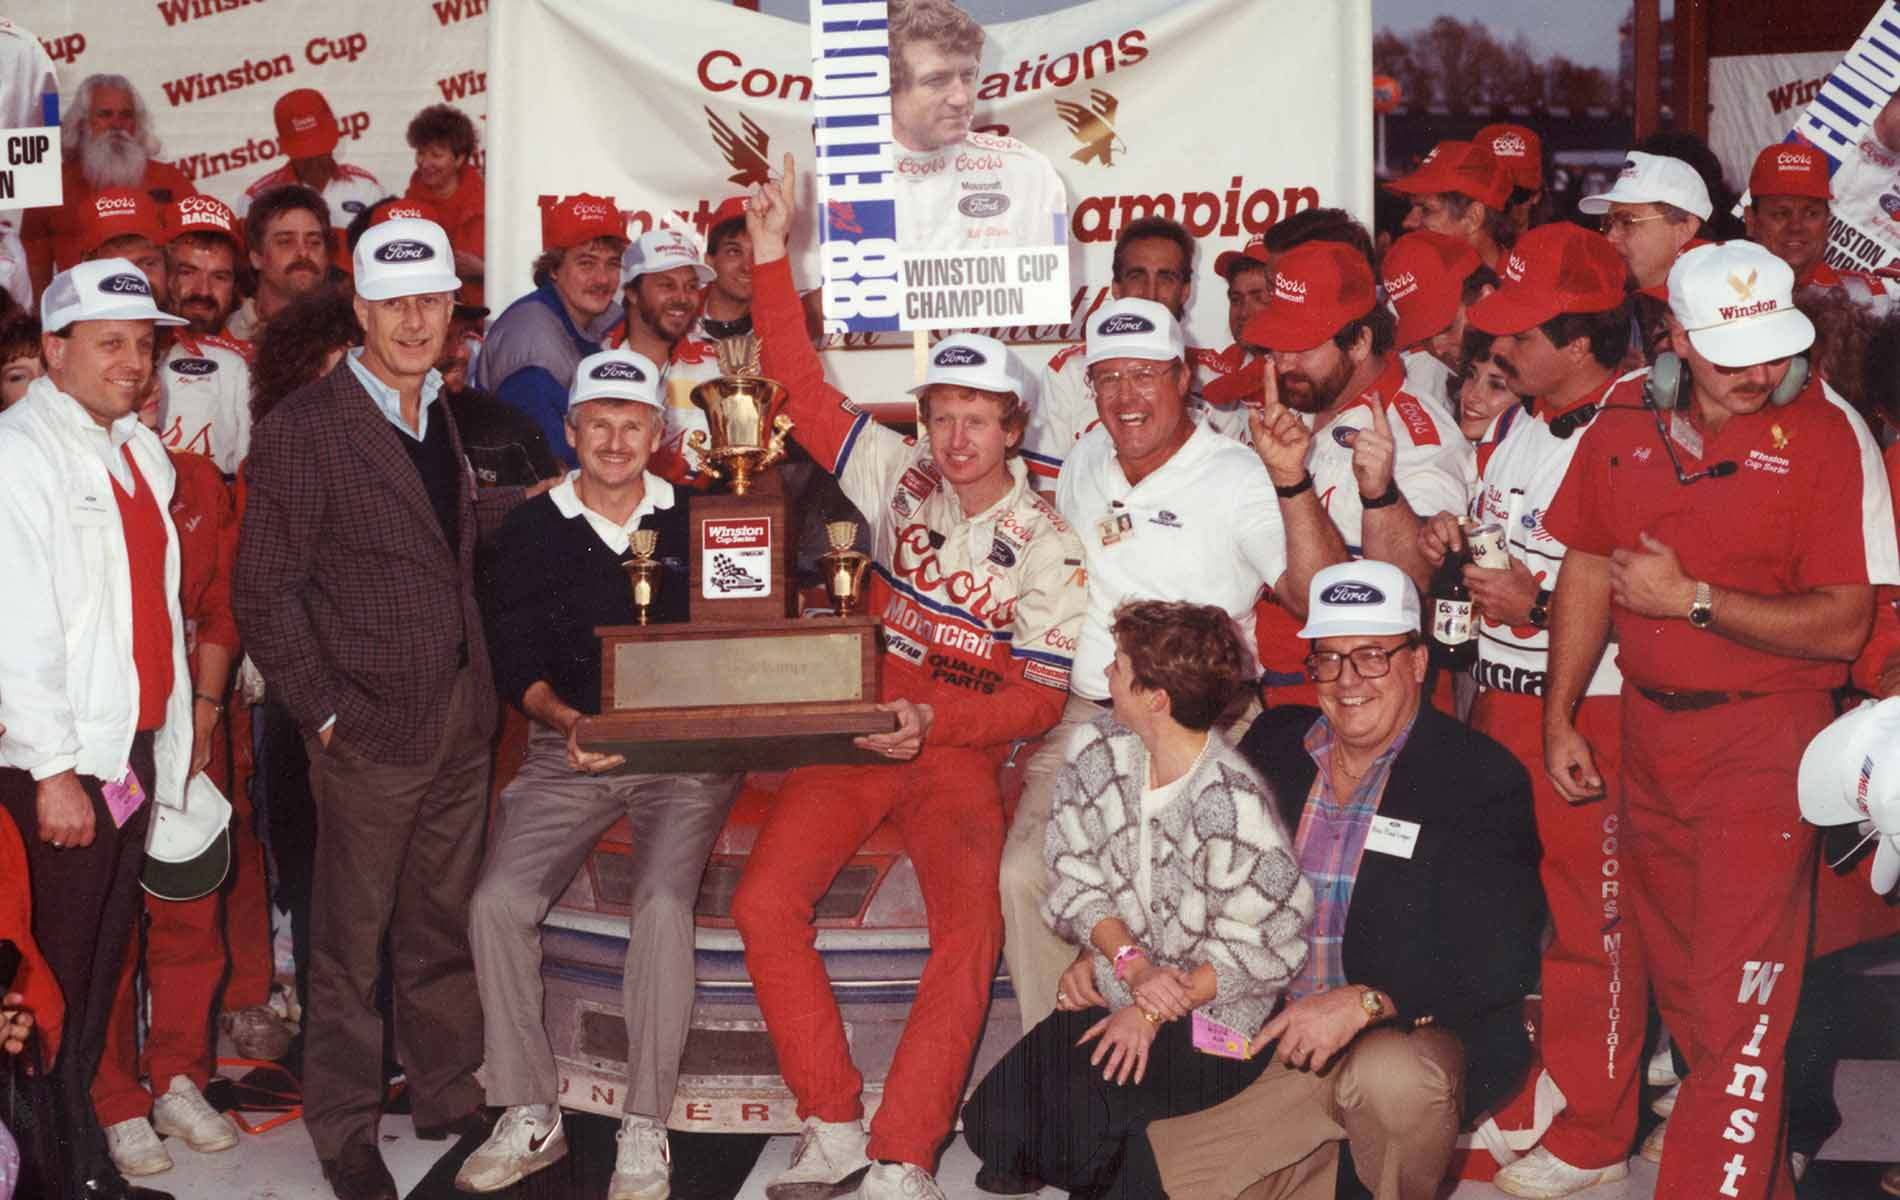 1988 Winston Cup Champion